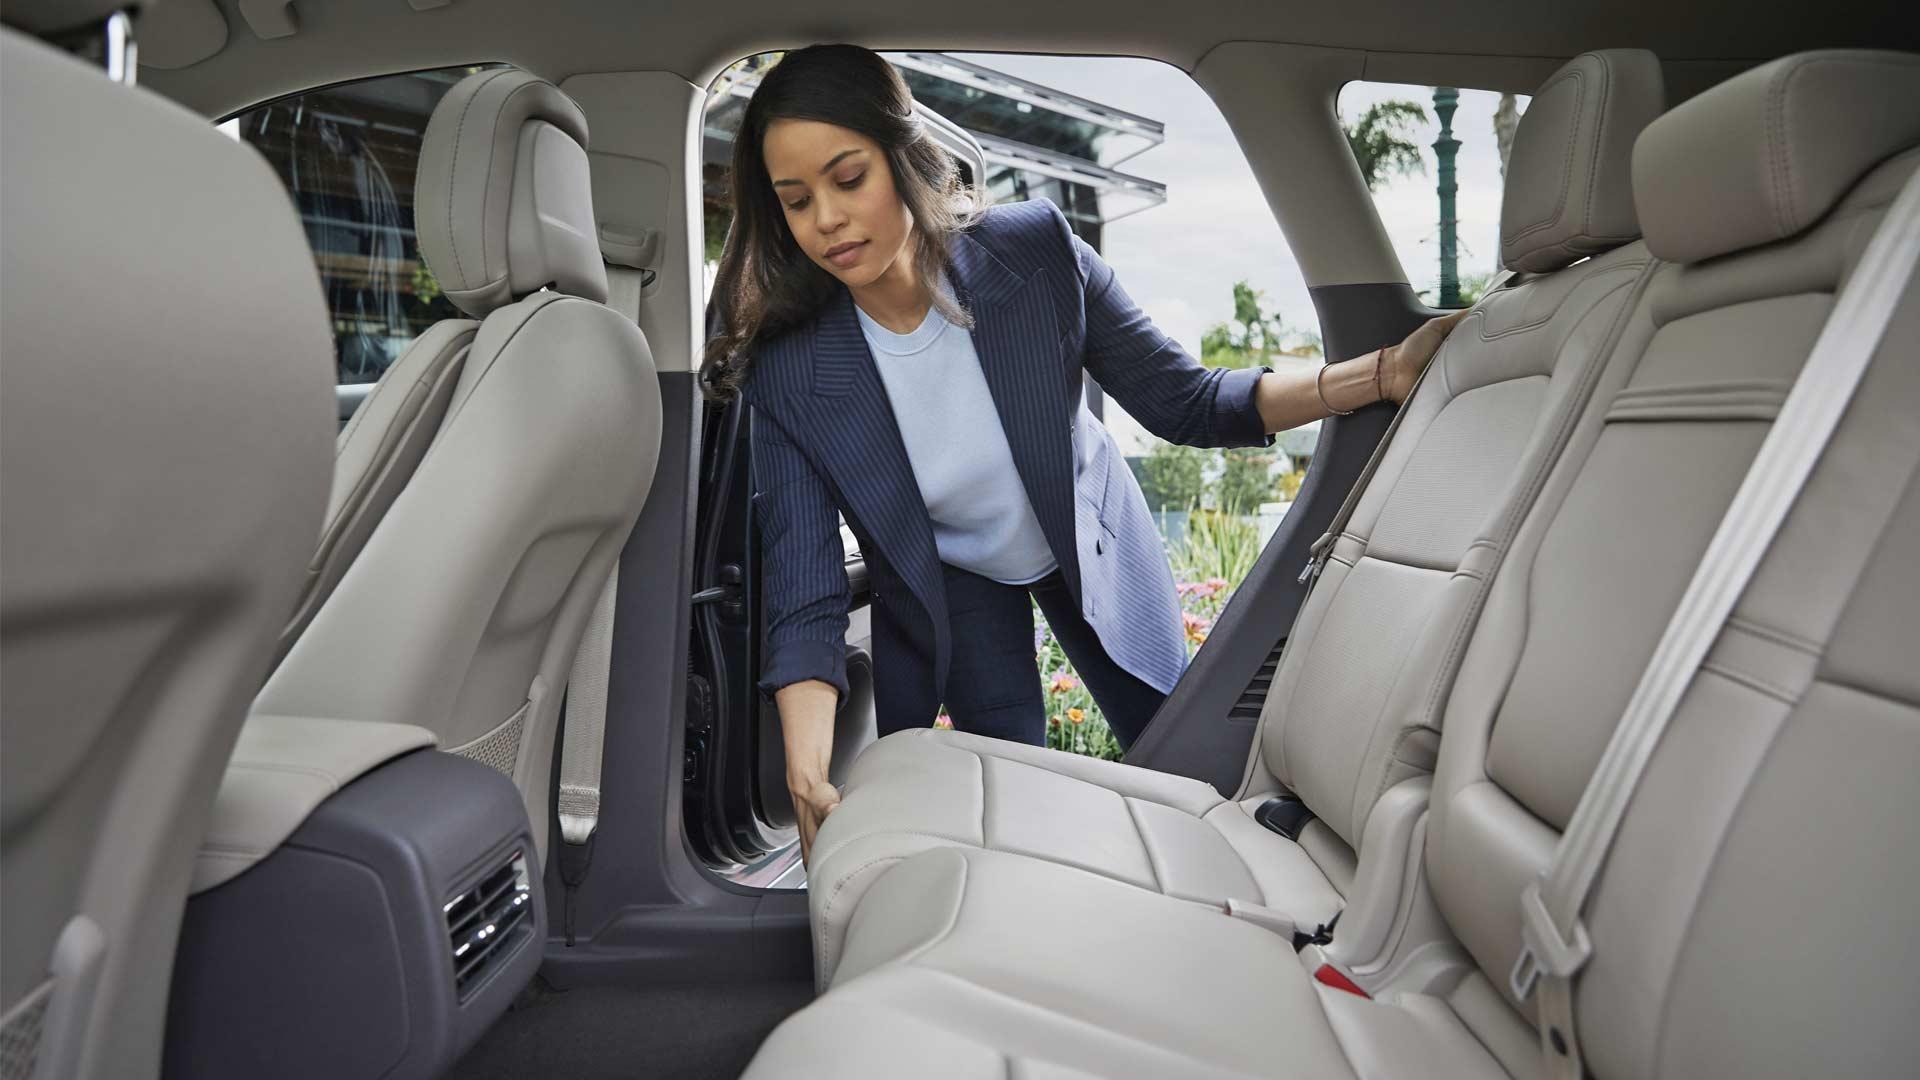 2020 Lincoln Corsair Navigates Into Compact Luxury Segment